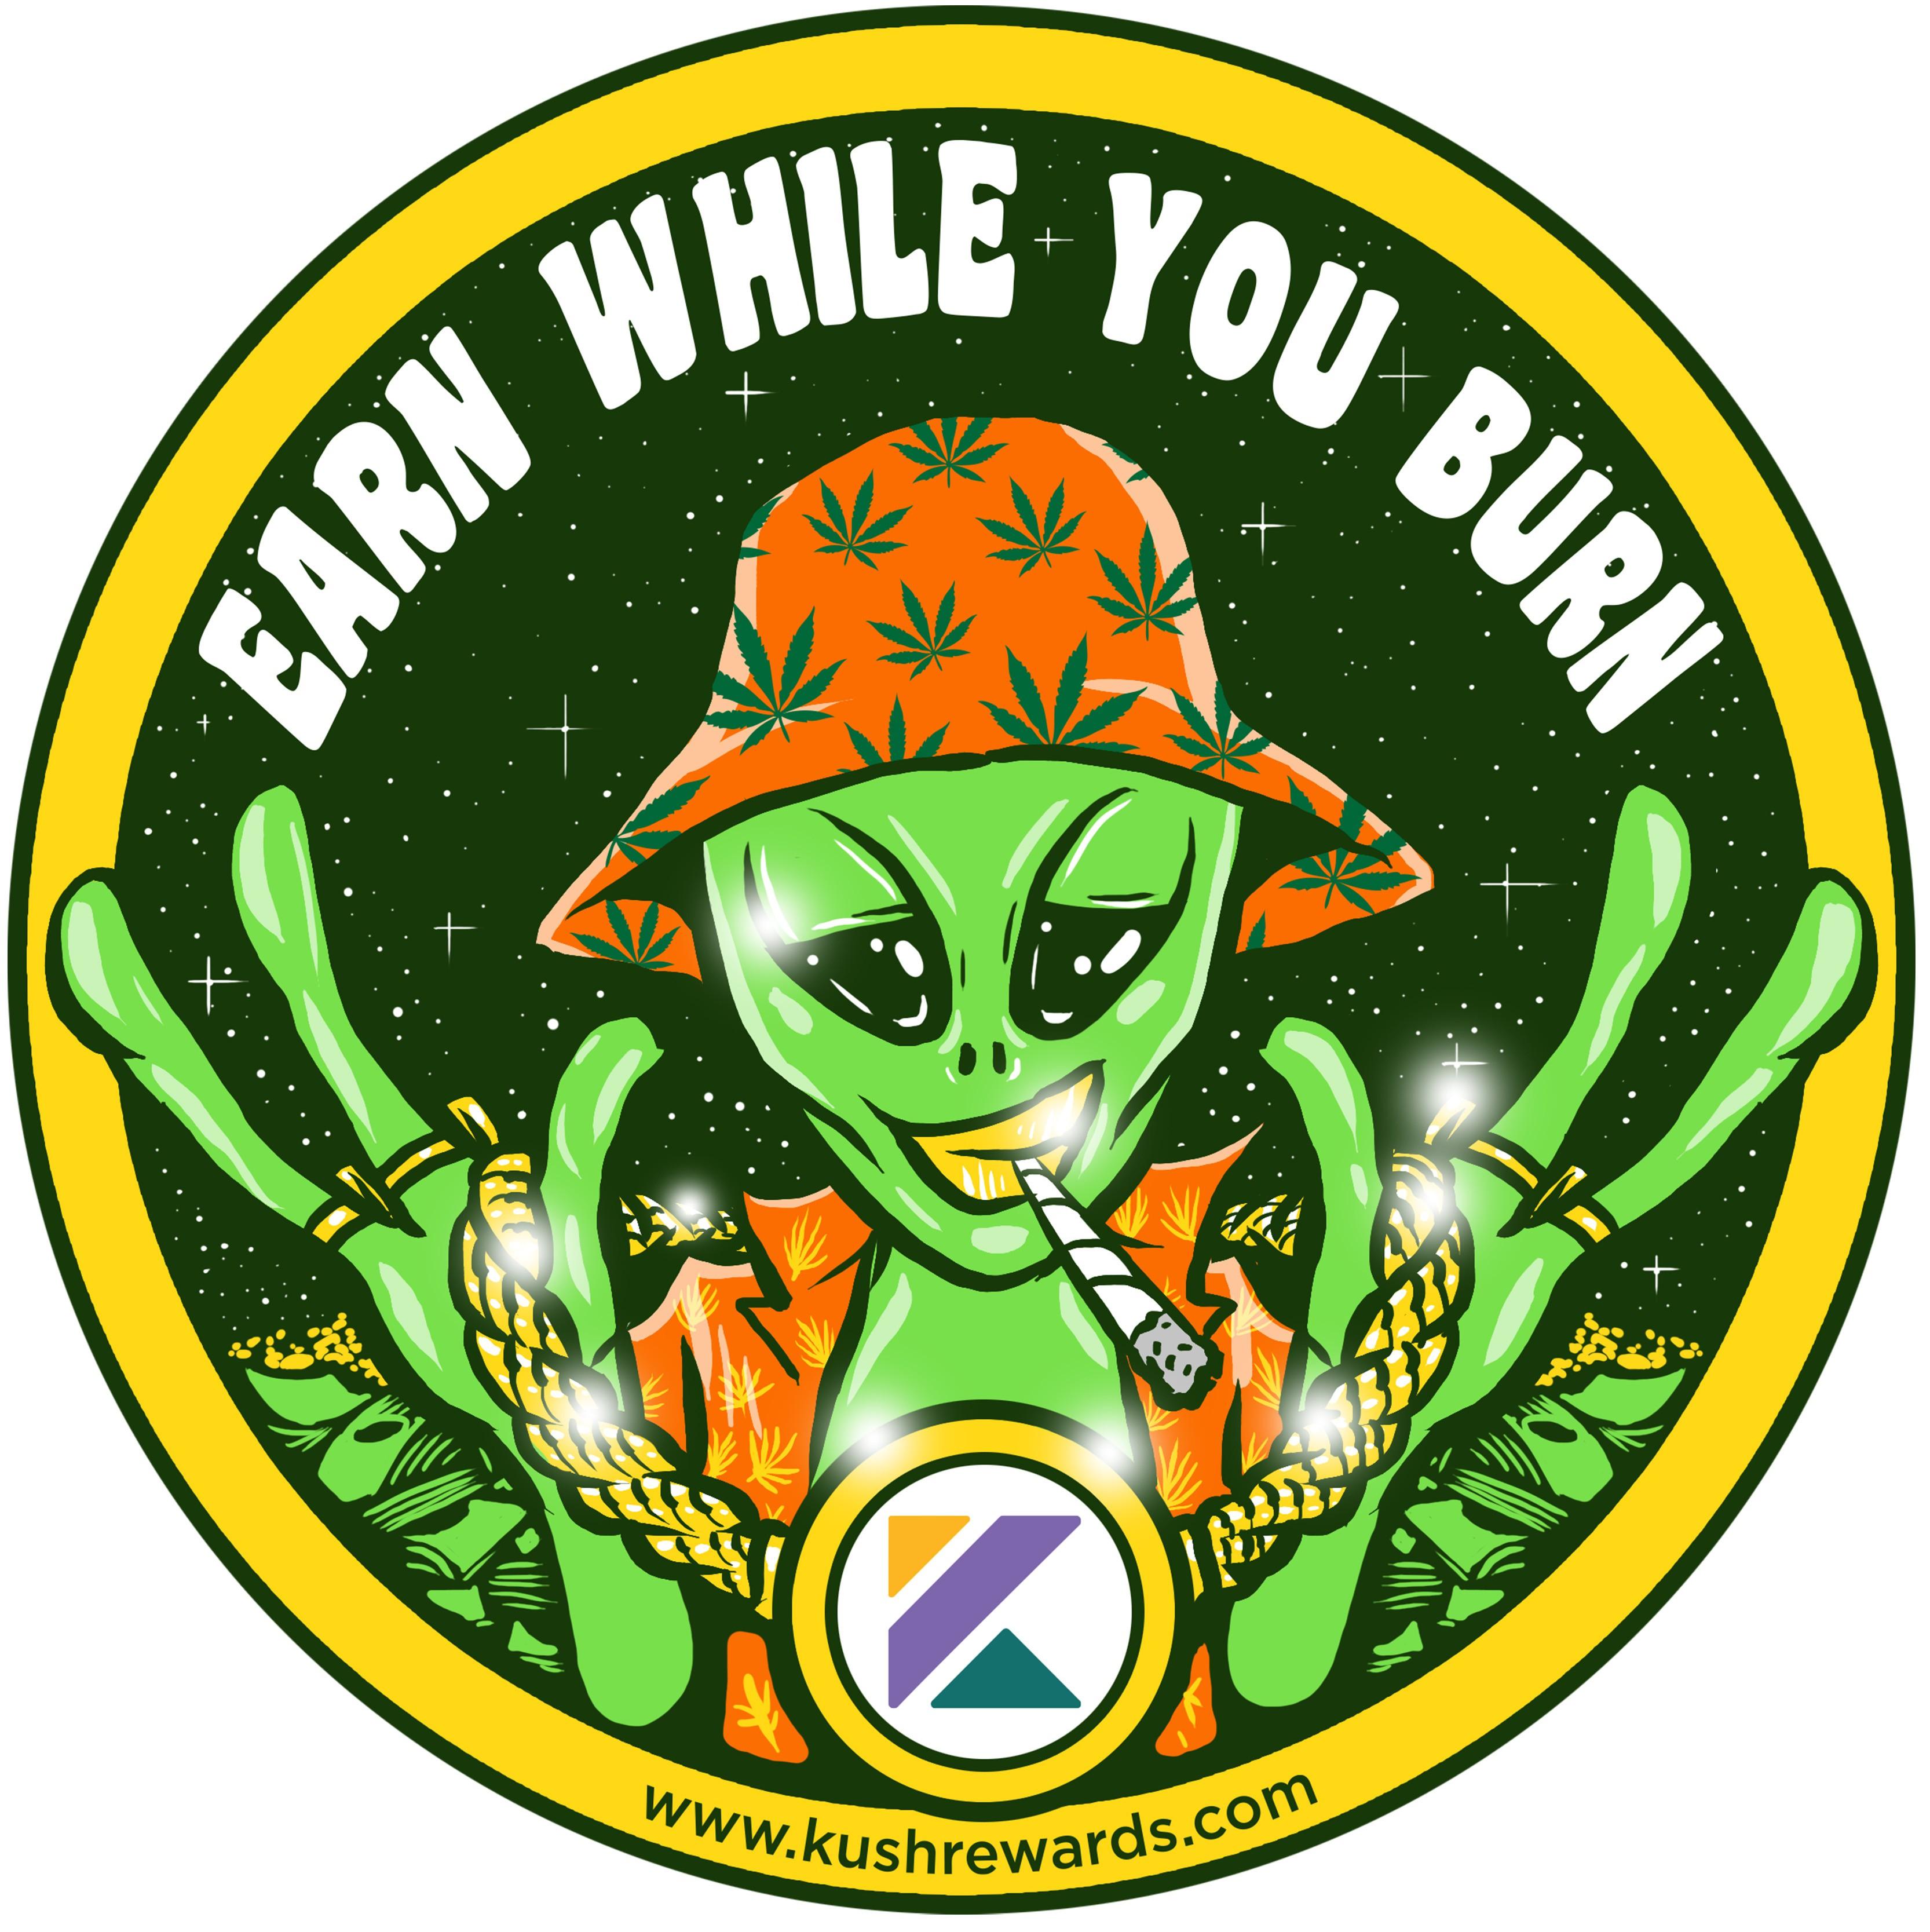 Sticker design for Kush Rewards